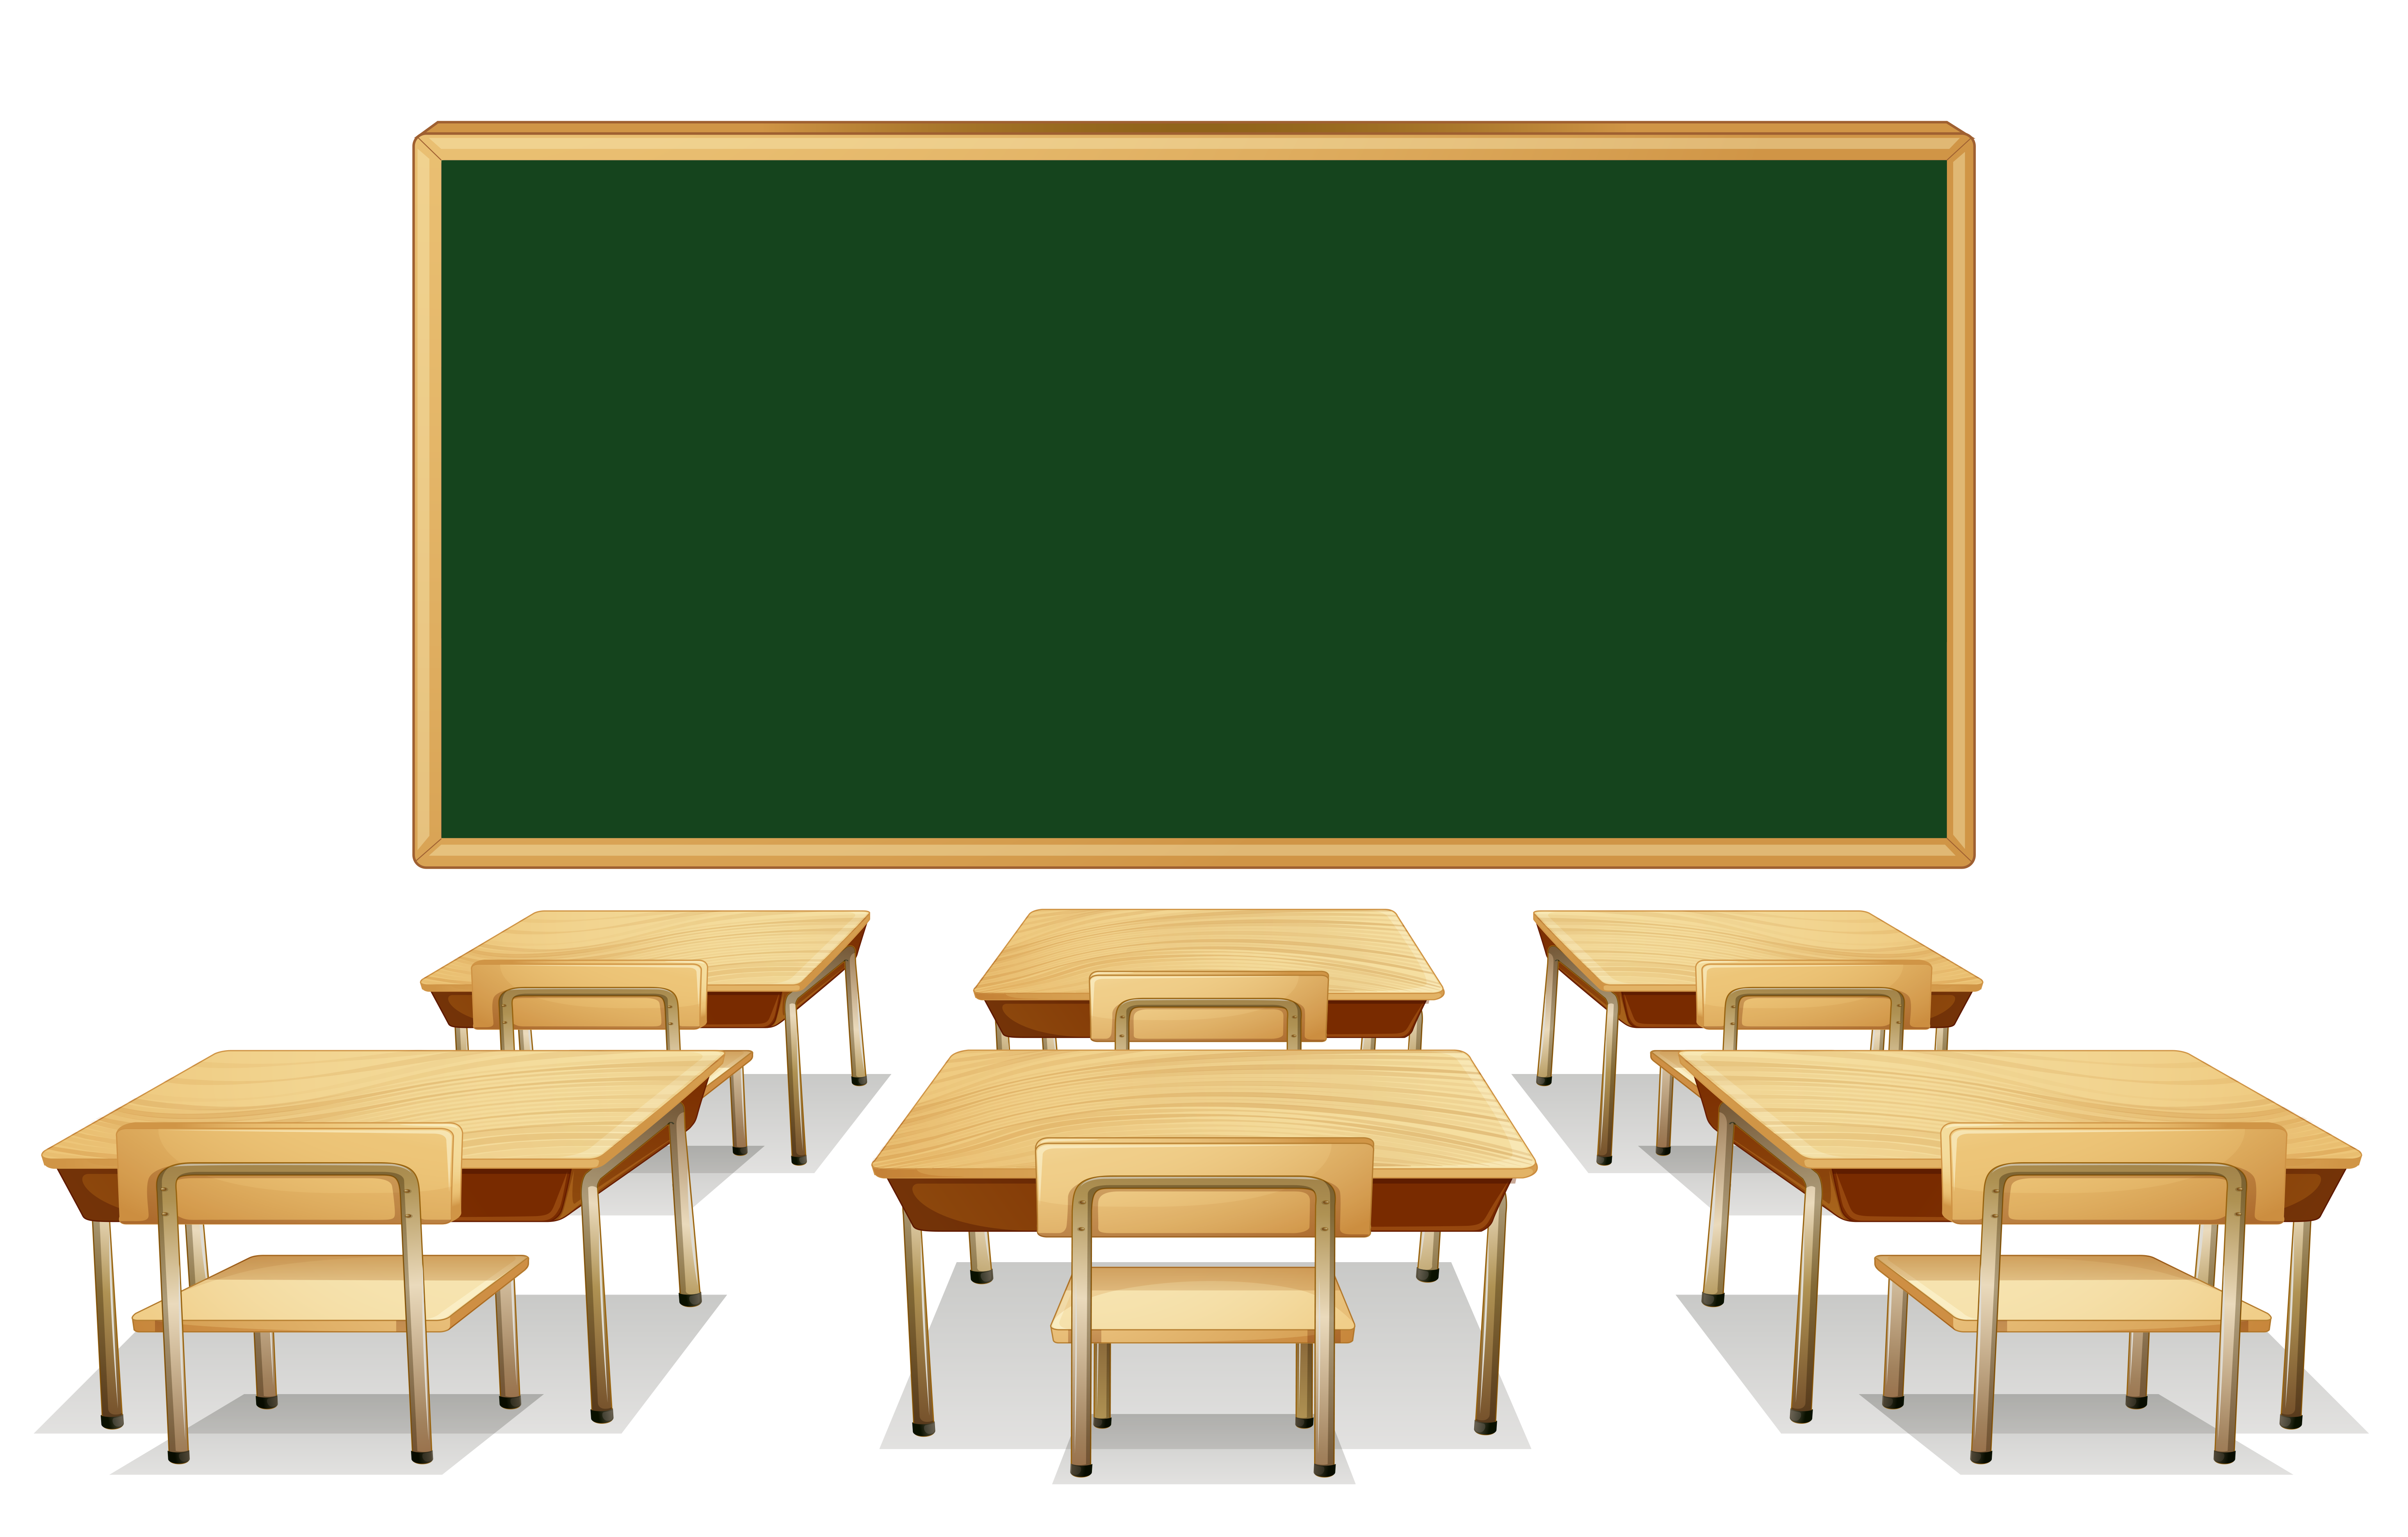 free classroom clipart-free classroom clipart-6